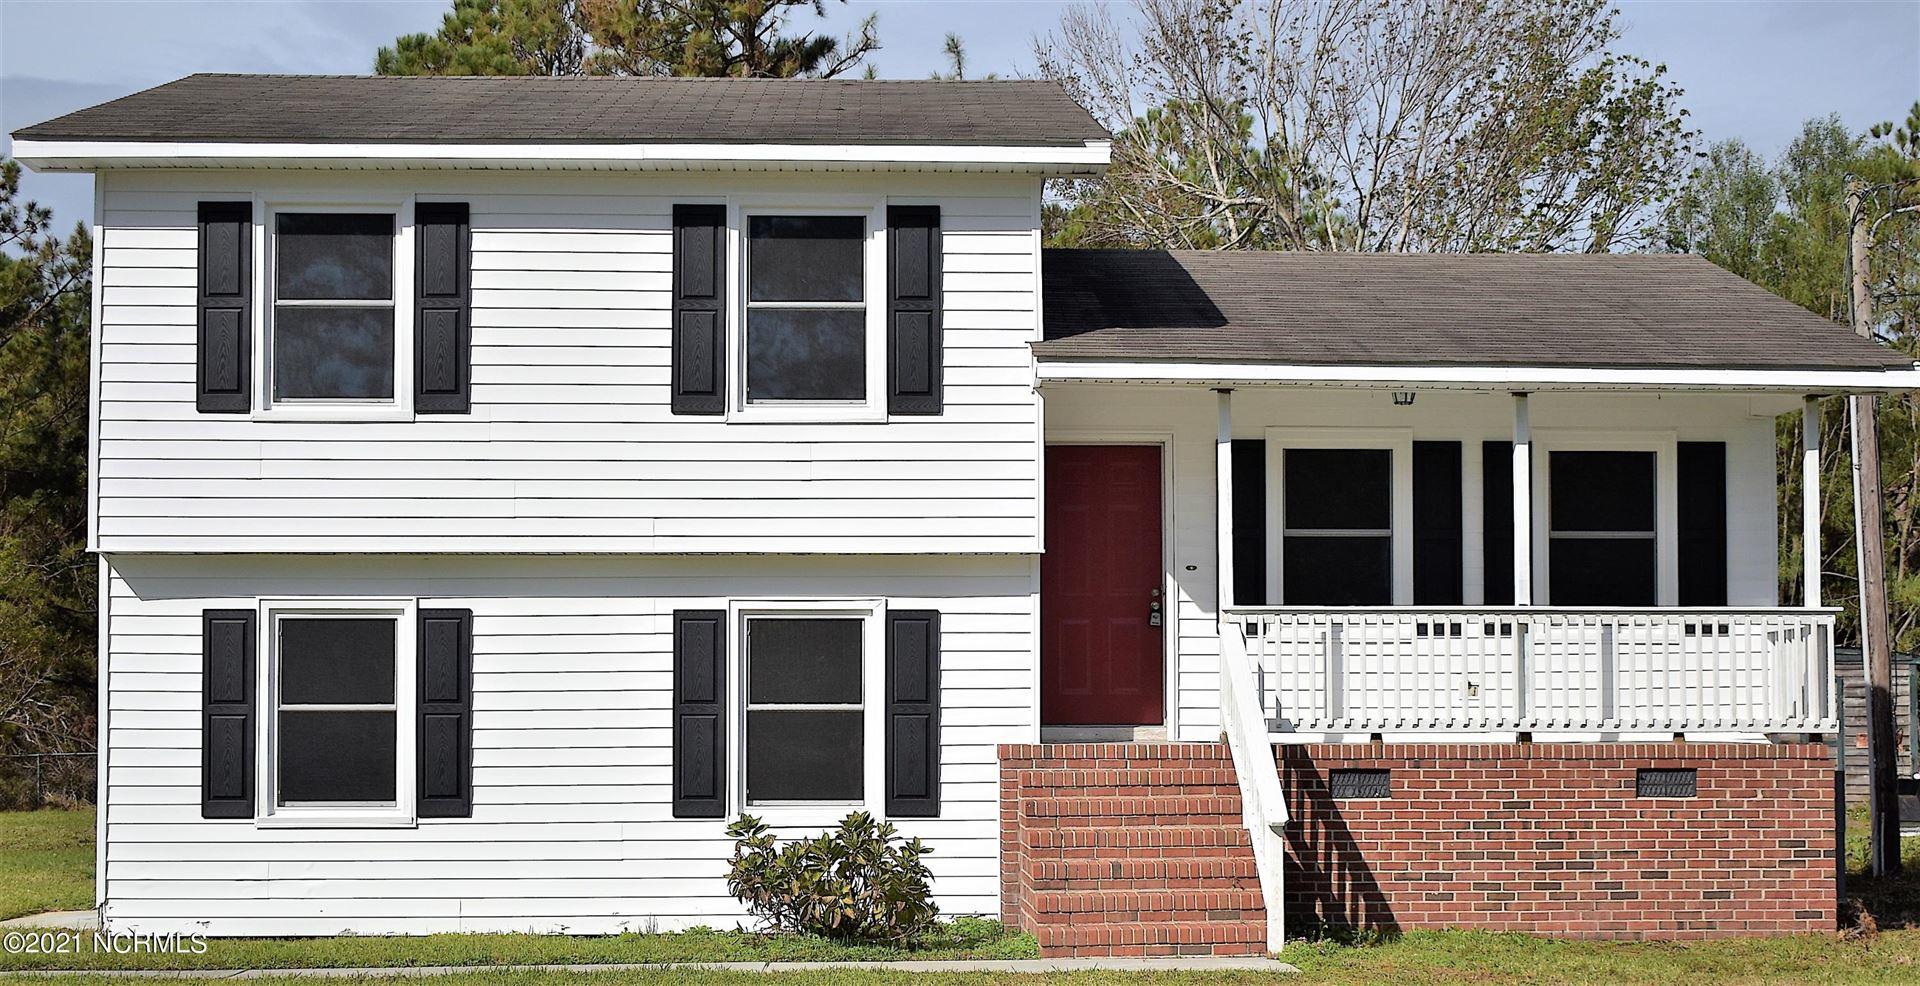 Photo of 1362 Hibbs Road, Newport, NC 28570 (MLS # 100284943)